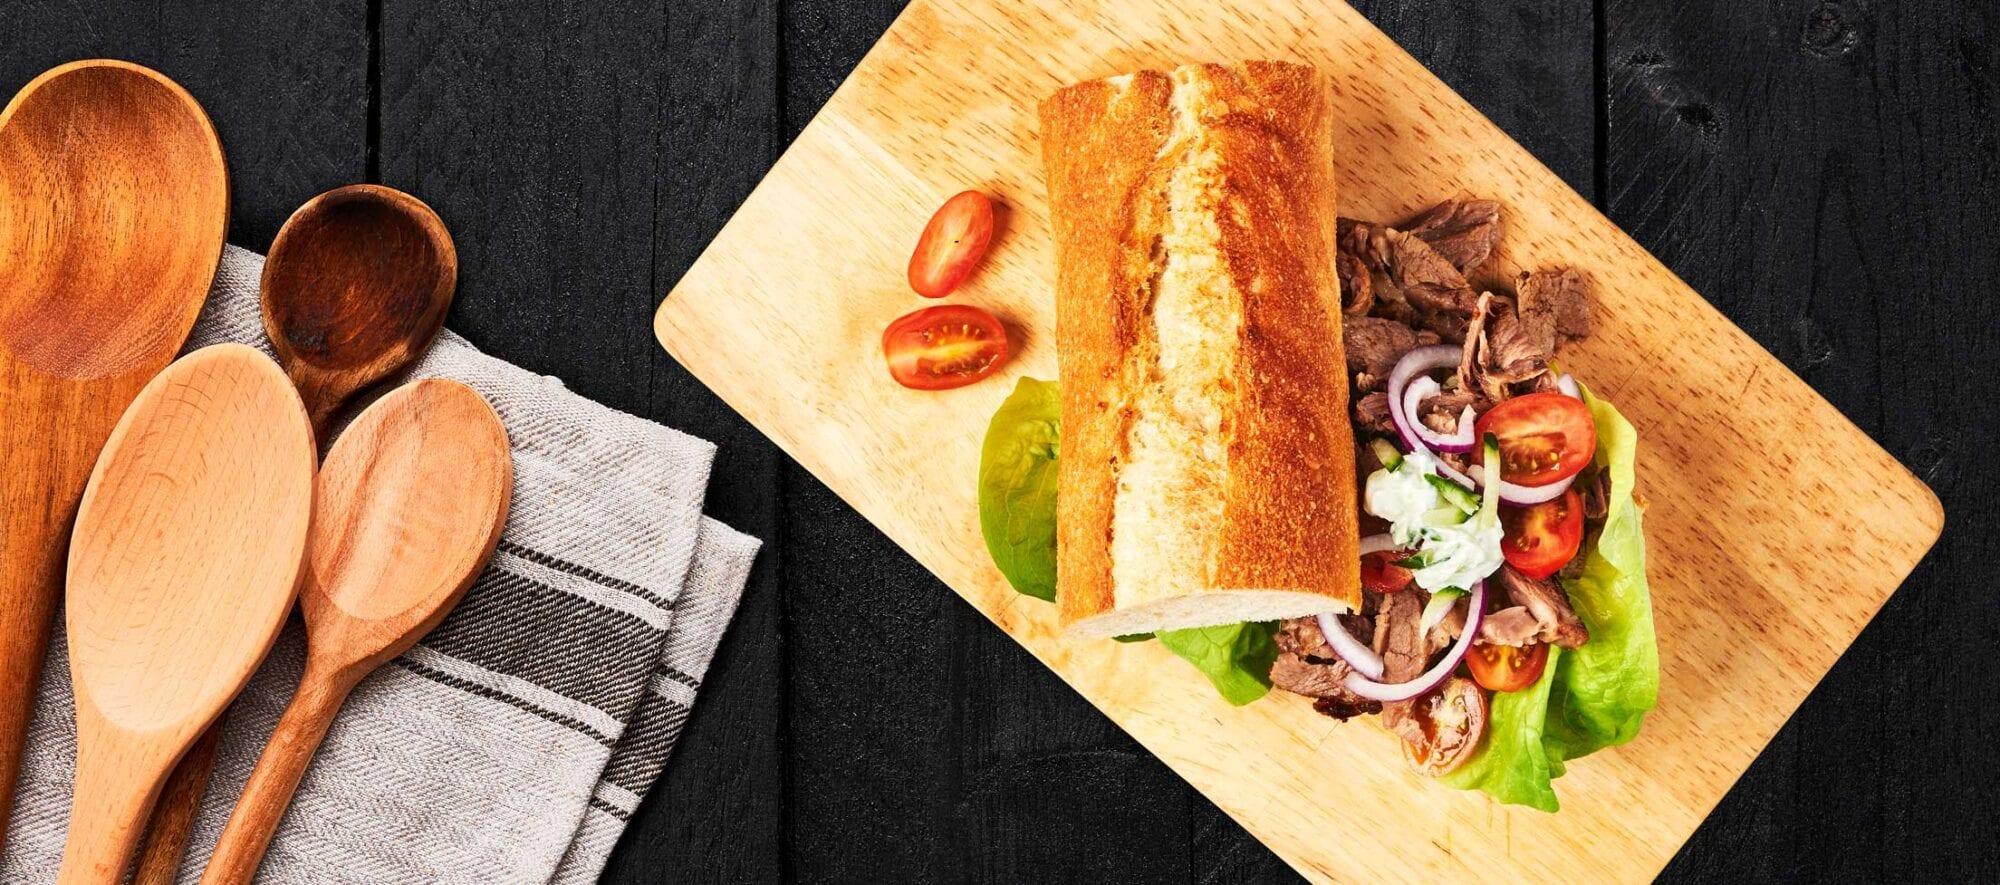 Pulled lam sandwich